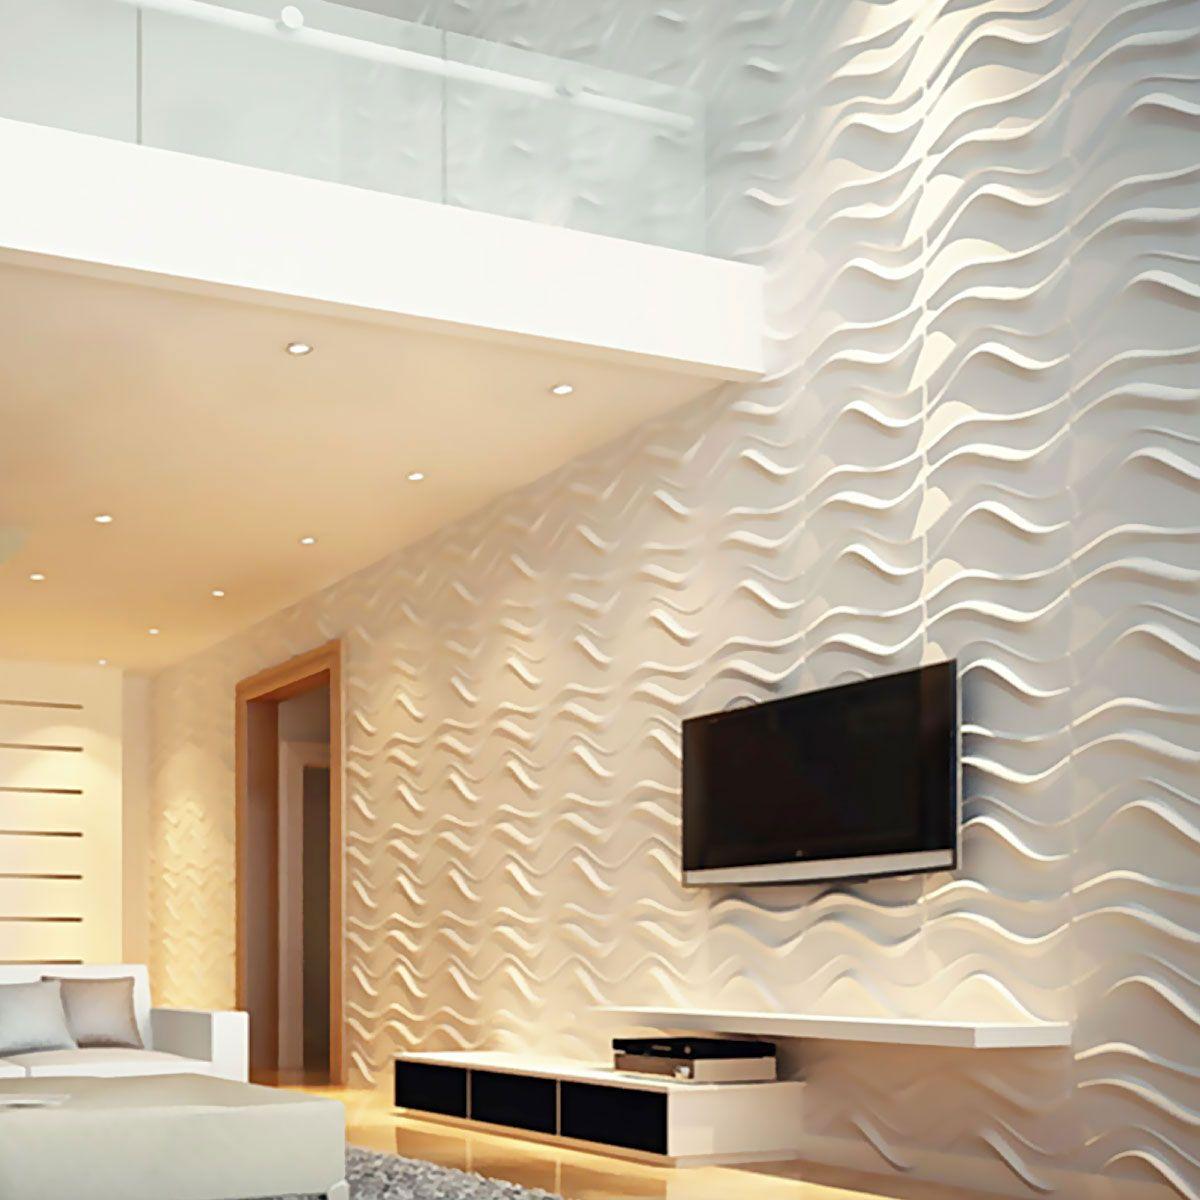 19 5 8 Inch W X 19 5 8 Inch H Wave Endurawall Decorative 3d Wall